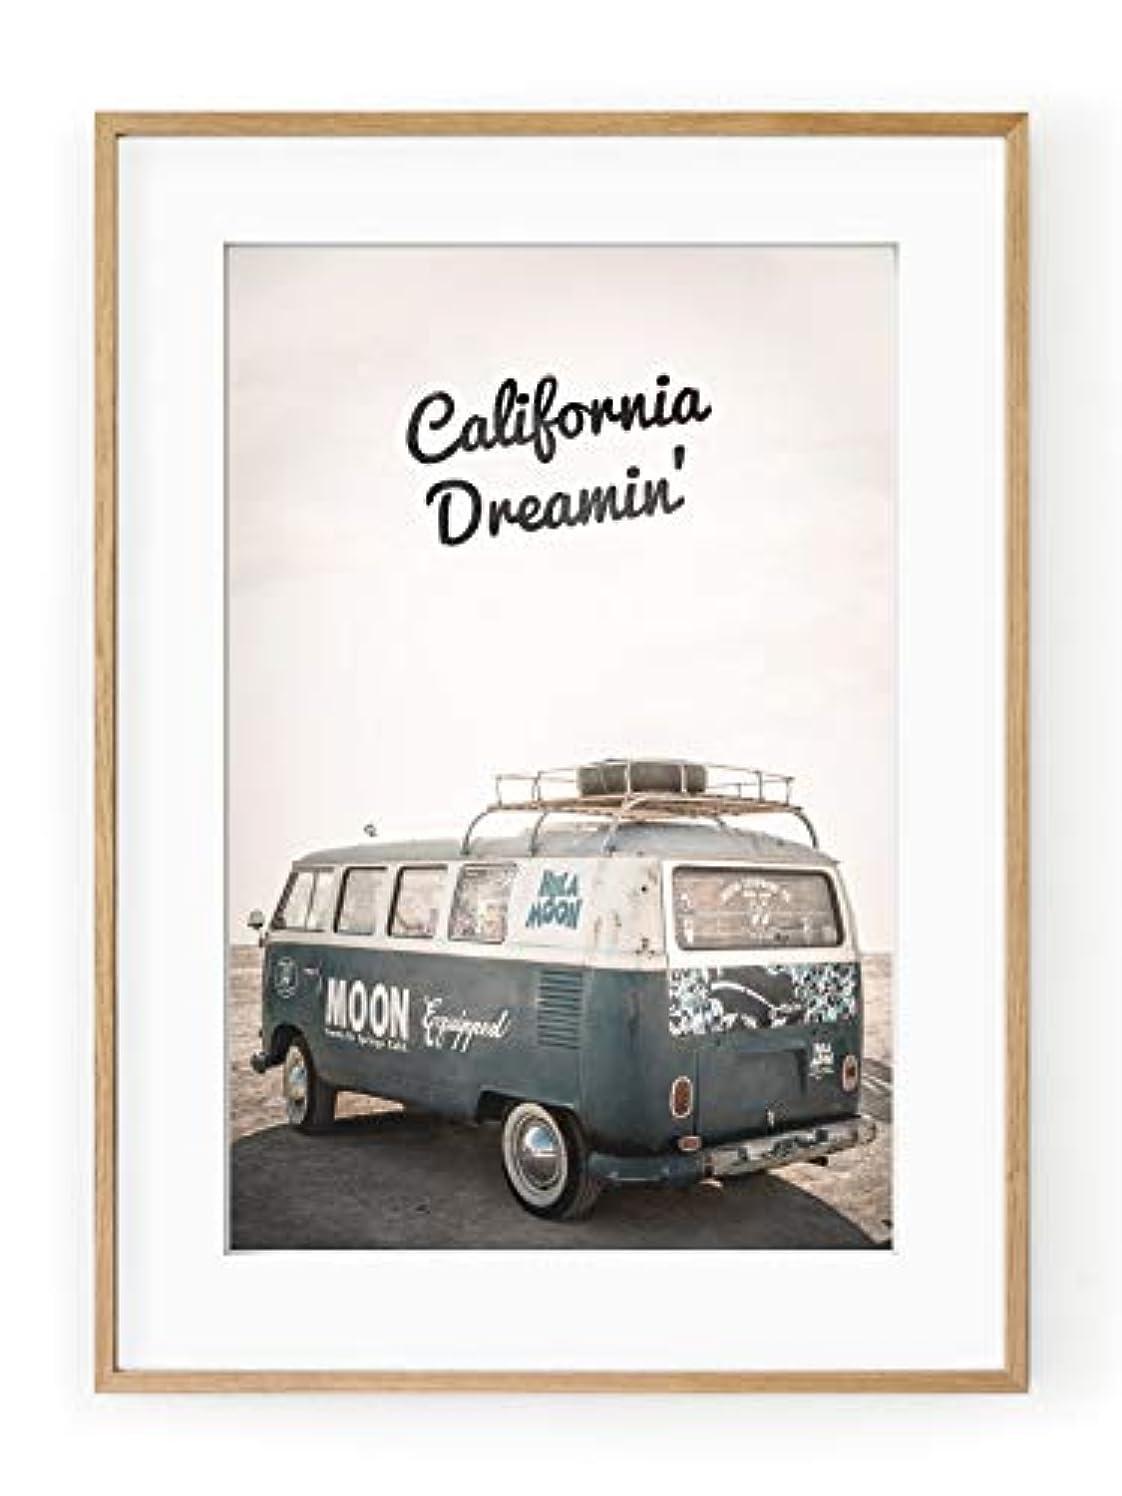 California Dreamin Satin Black Aluminium Frame with Mount, Multicolored, 30x40